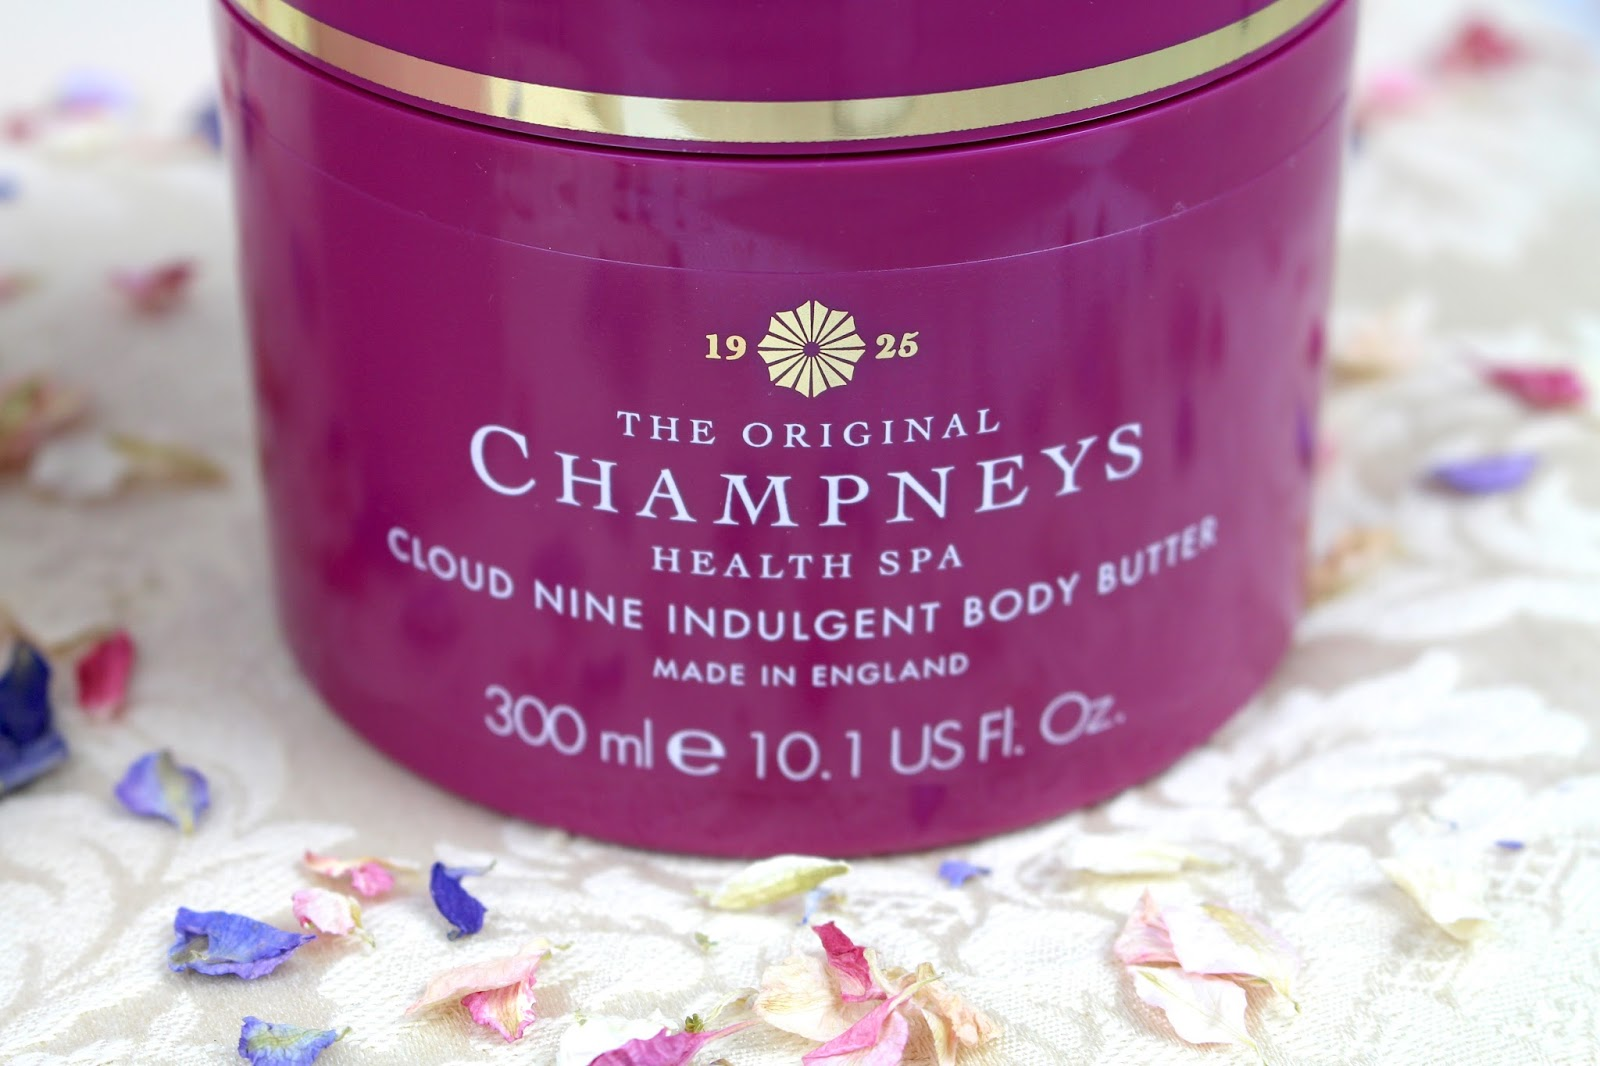 Champneys Cloud Nine Ingulgent Body Butter